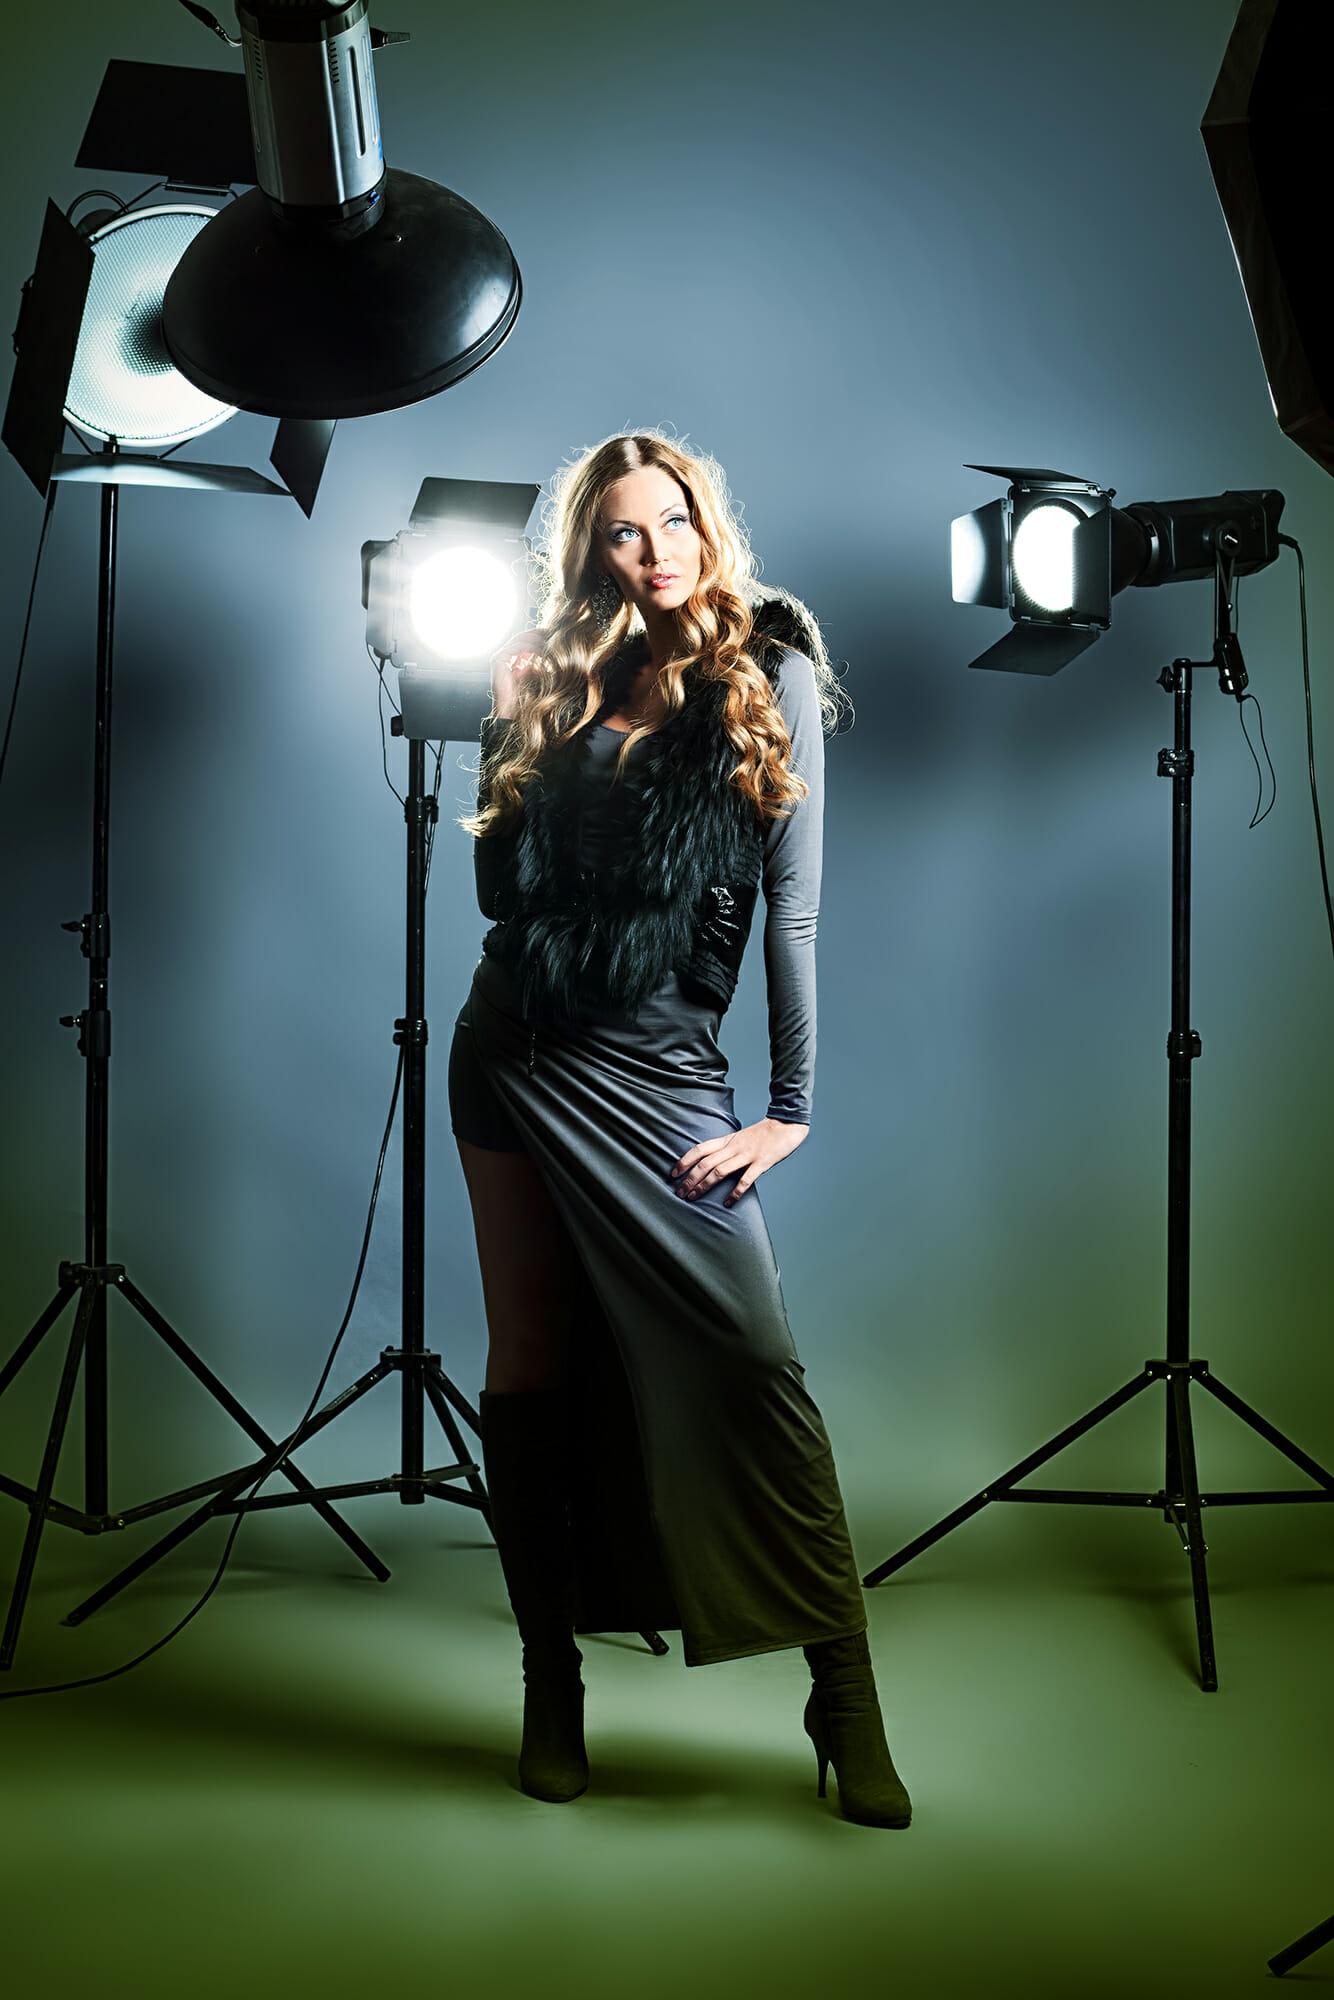 portrait photography tips lady dress studio